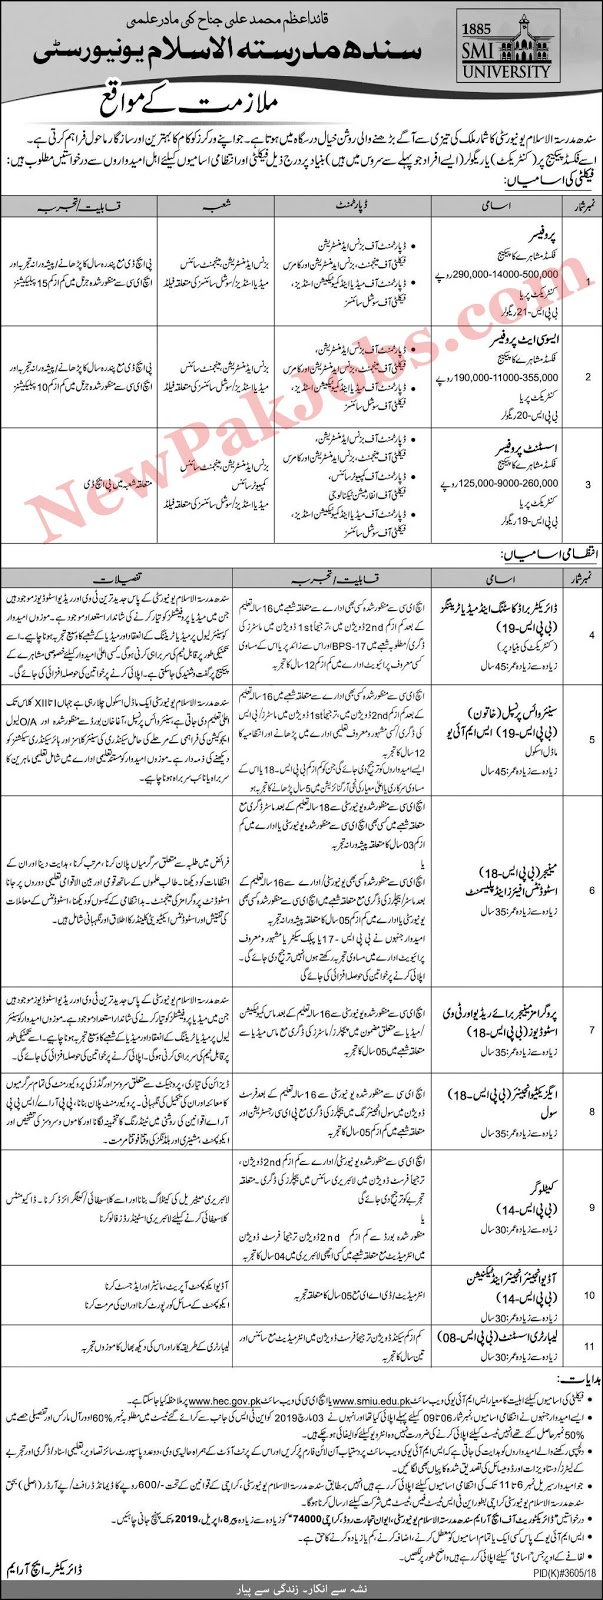 New Jobs In Sindh Madressatul Islam University 24 Mar 2019